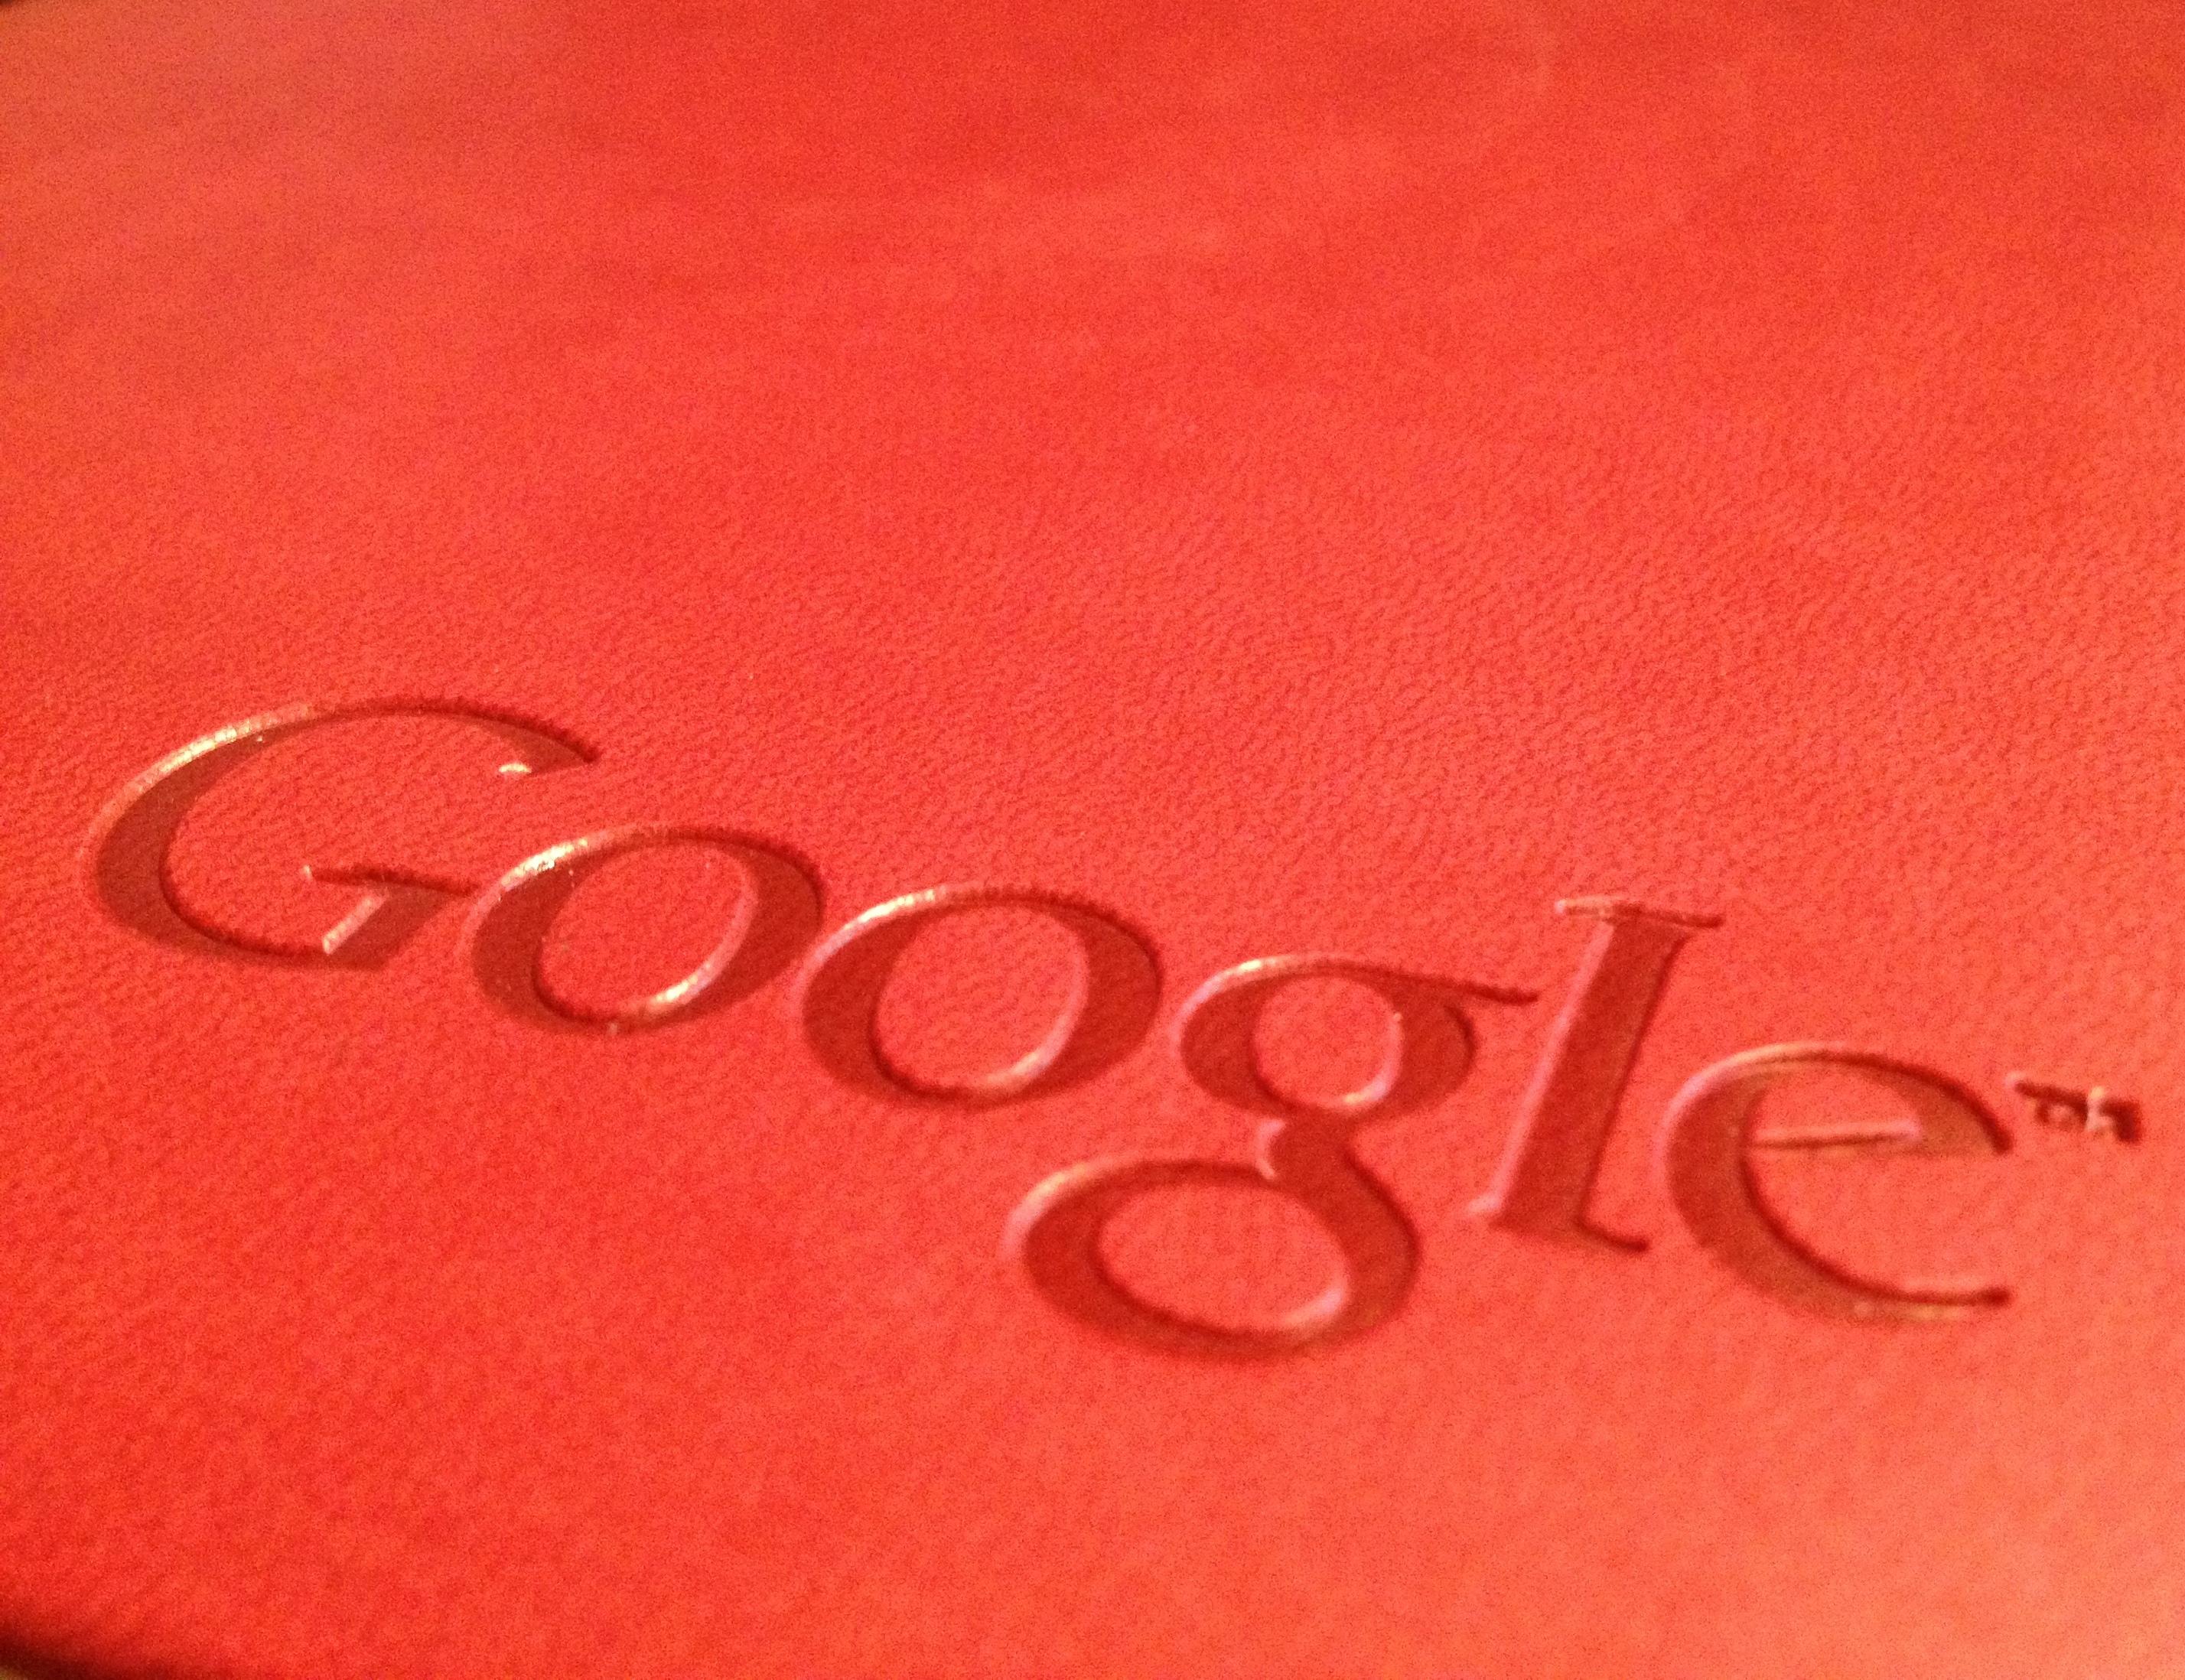 googleseesred